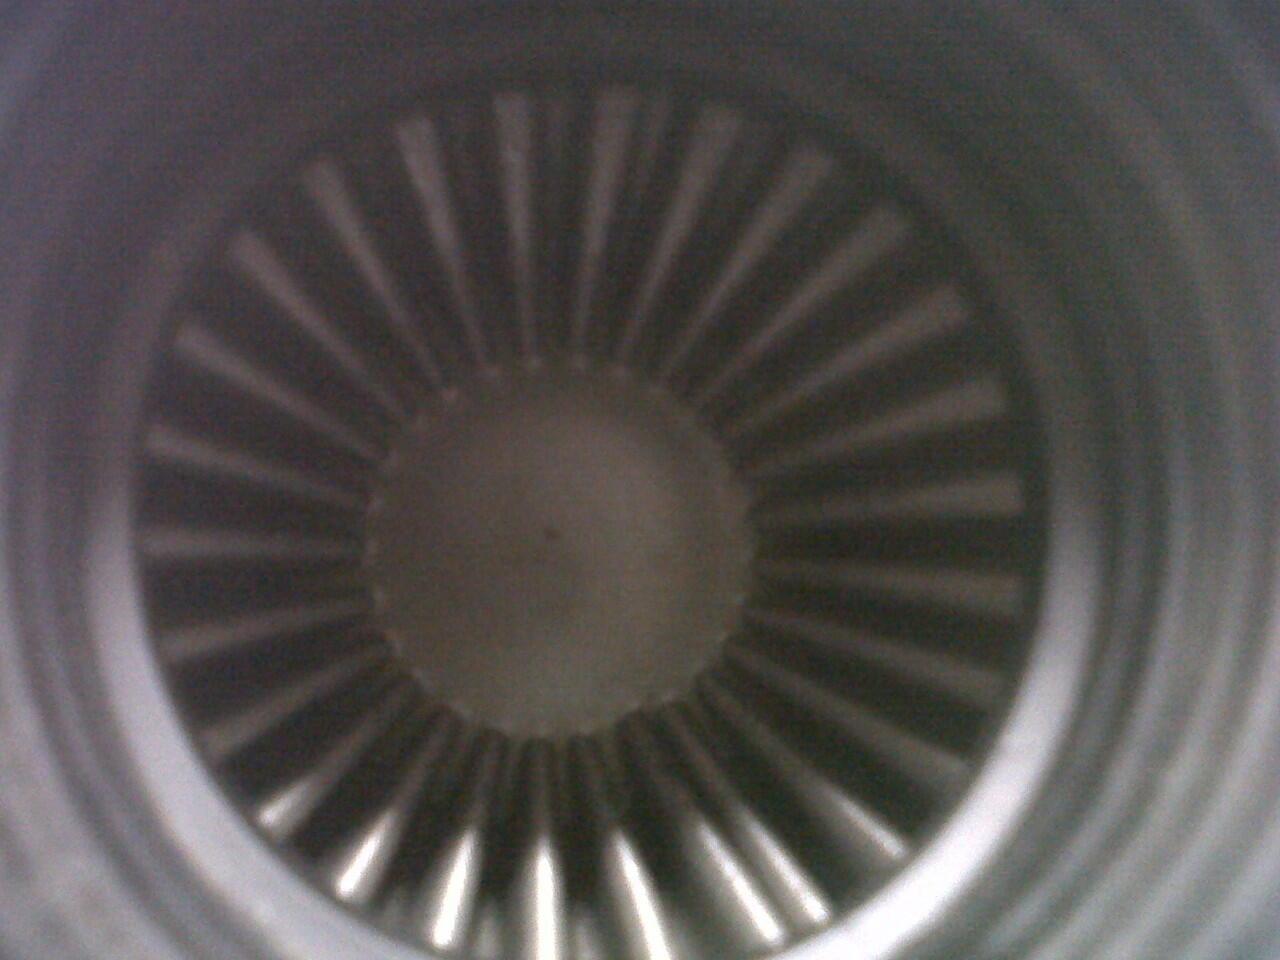 filter karbu TDR racing untuk karbu ukuran 26 - 28 mulus bandung